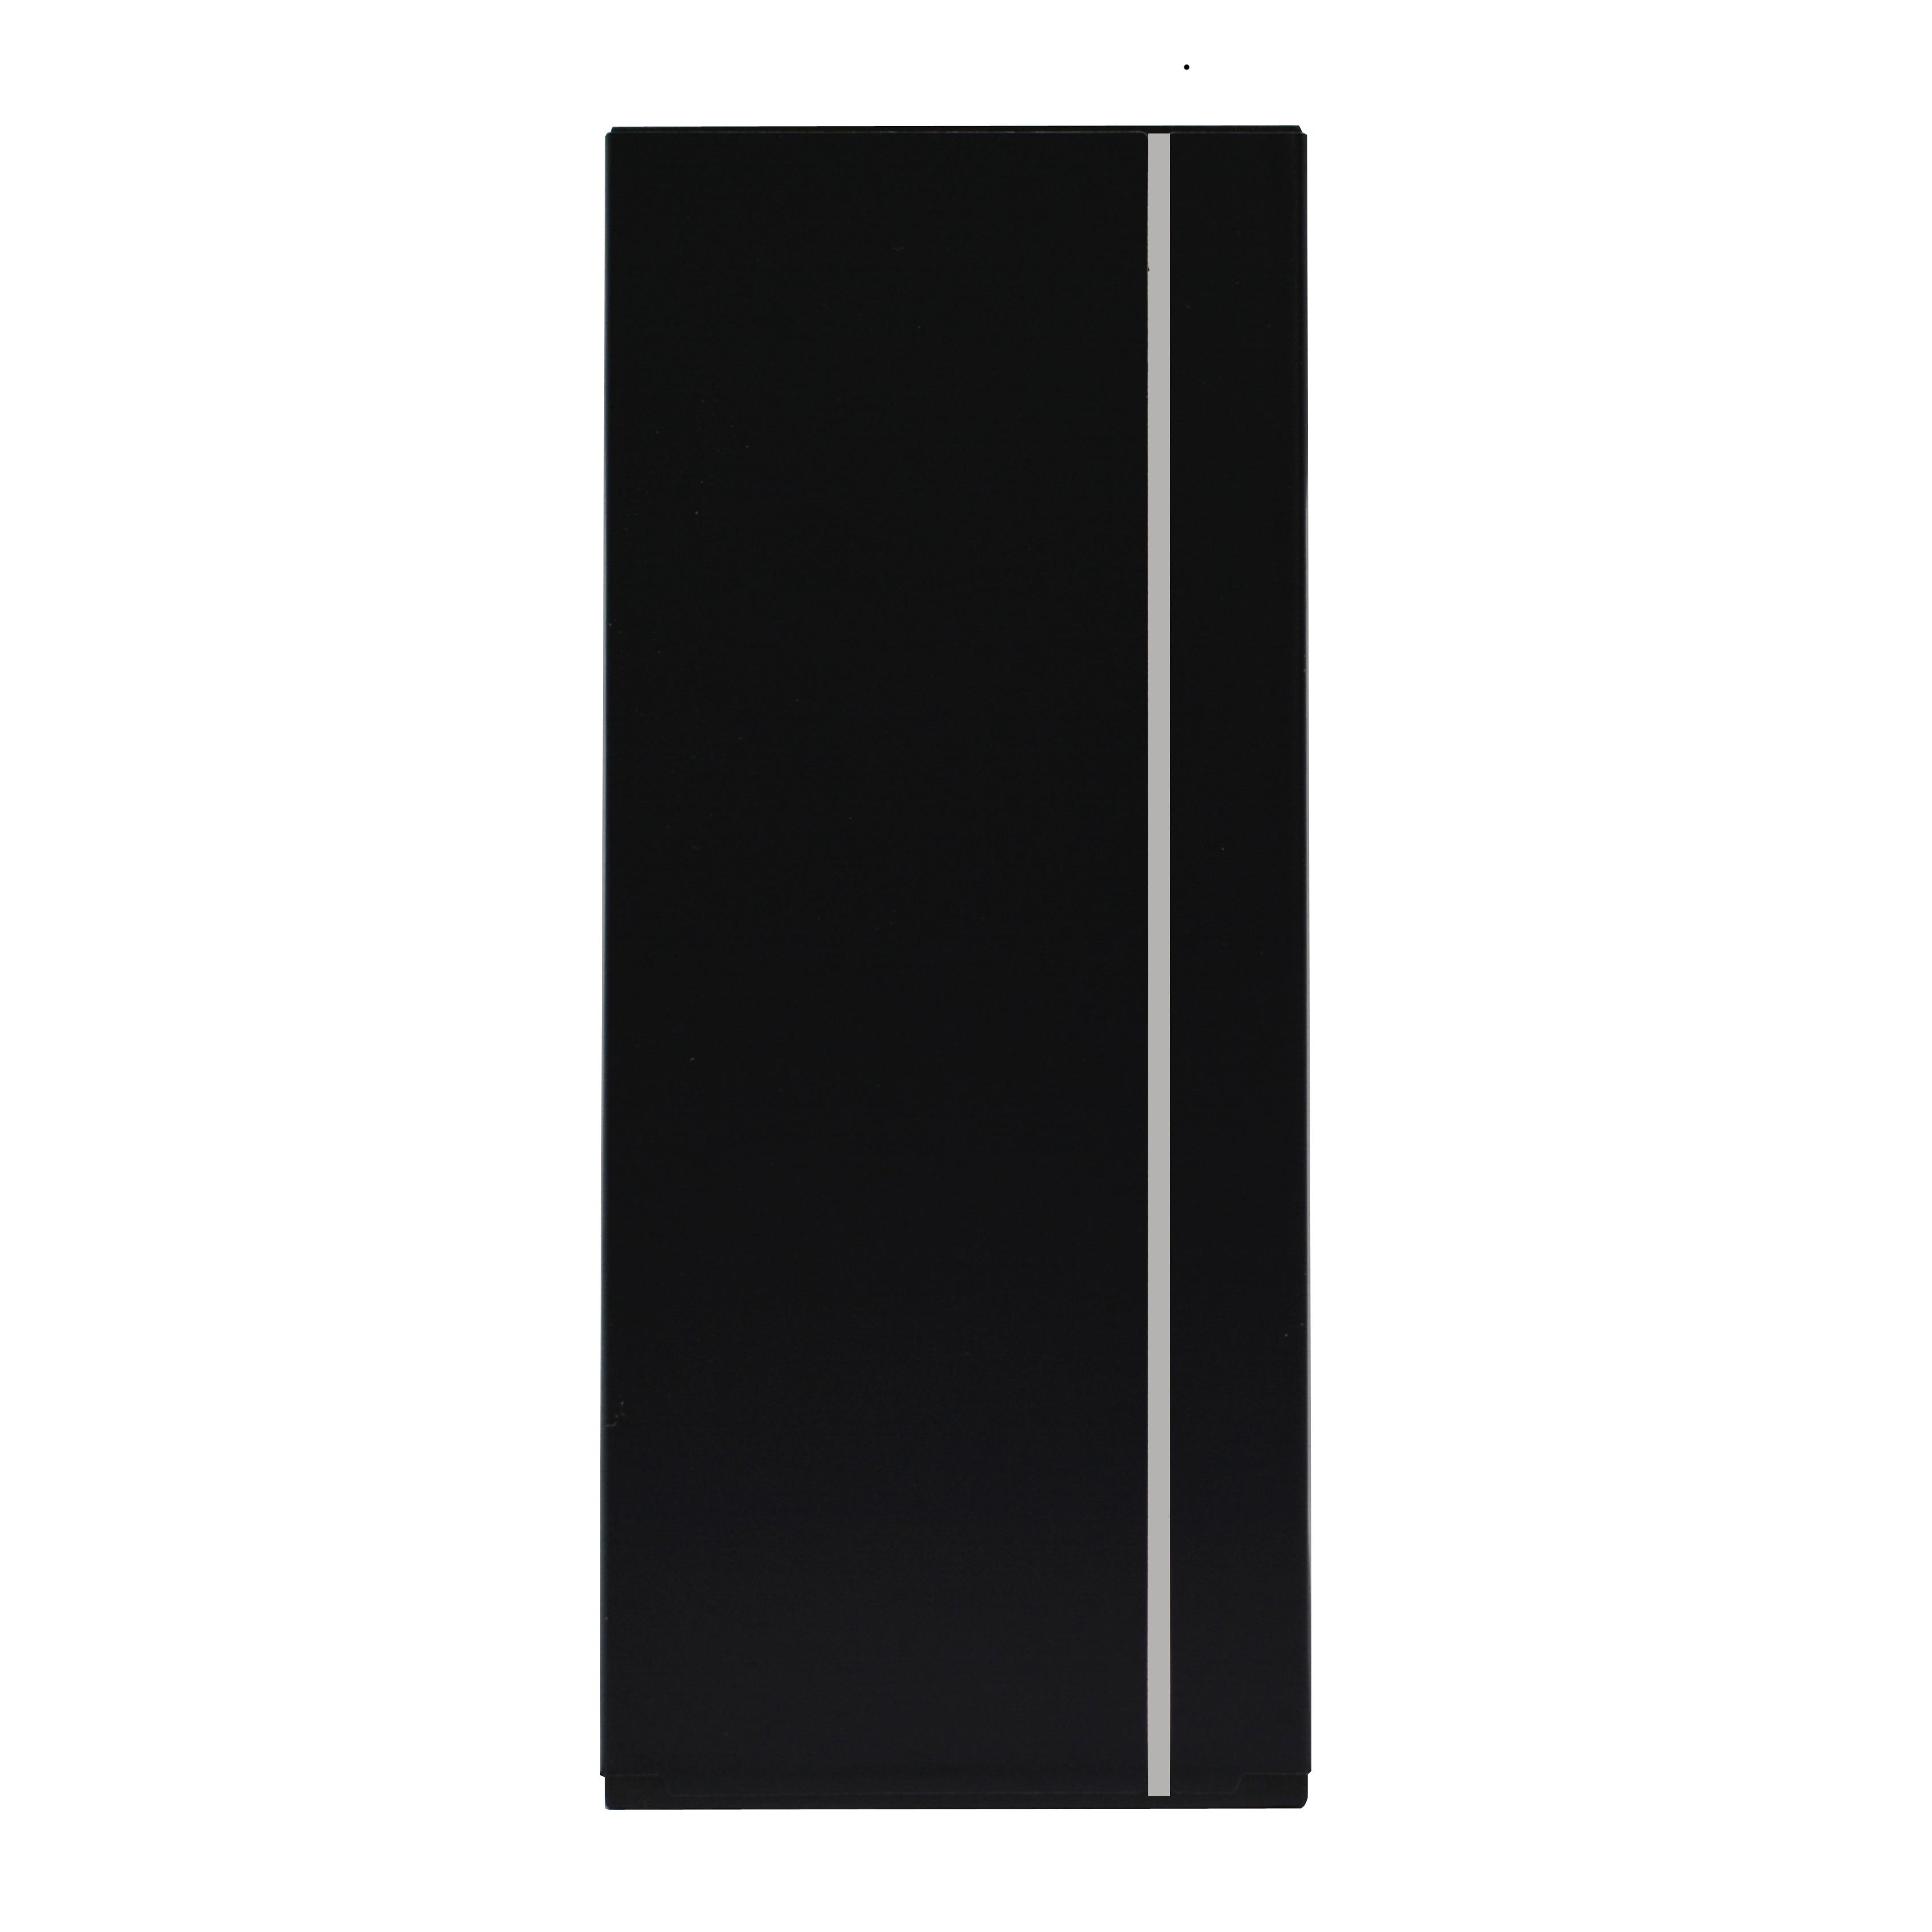 20pcs/lot Battery HB4342A1RBC For Huawei y5II Y5 II 2 Ascend 5+ Y6 honor 4A SCL-TL00 honor 5A LYO-L21 Original Phone batteria enlarge